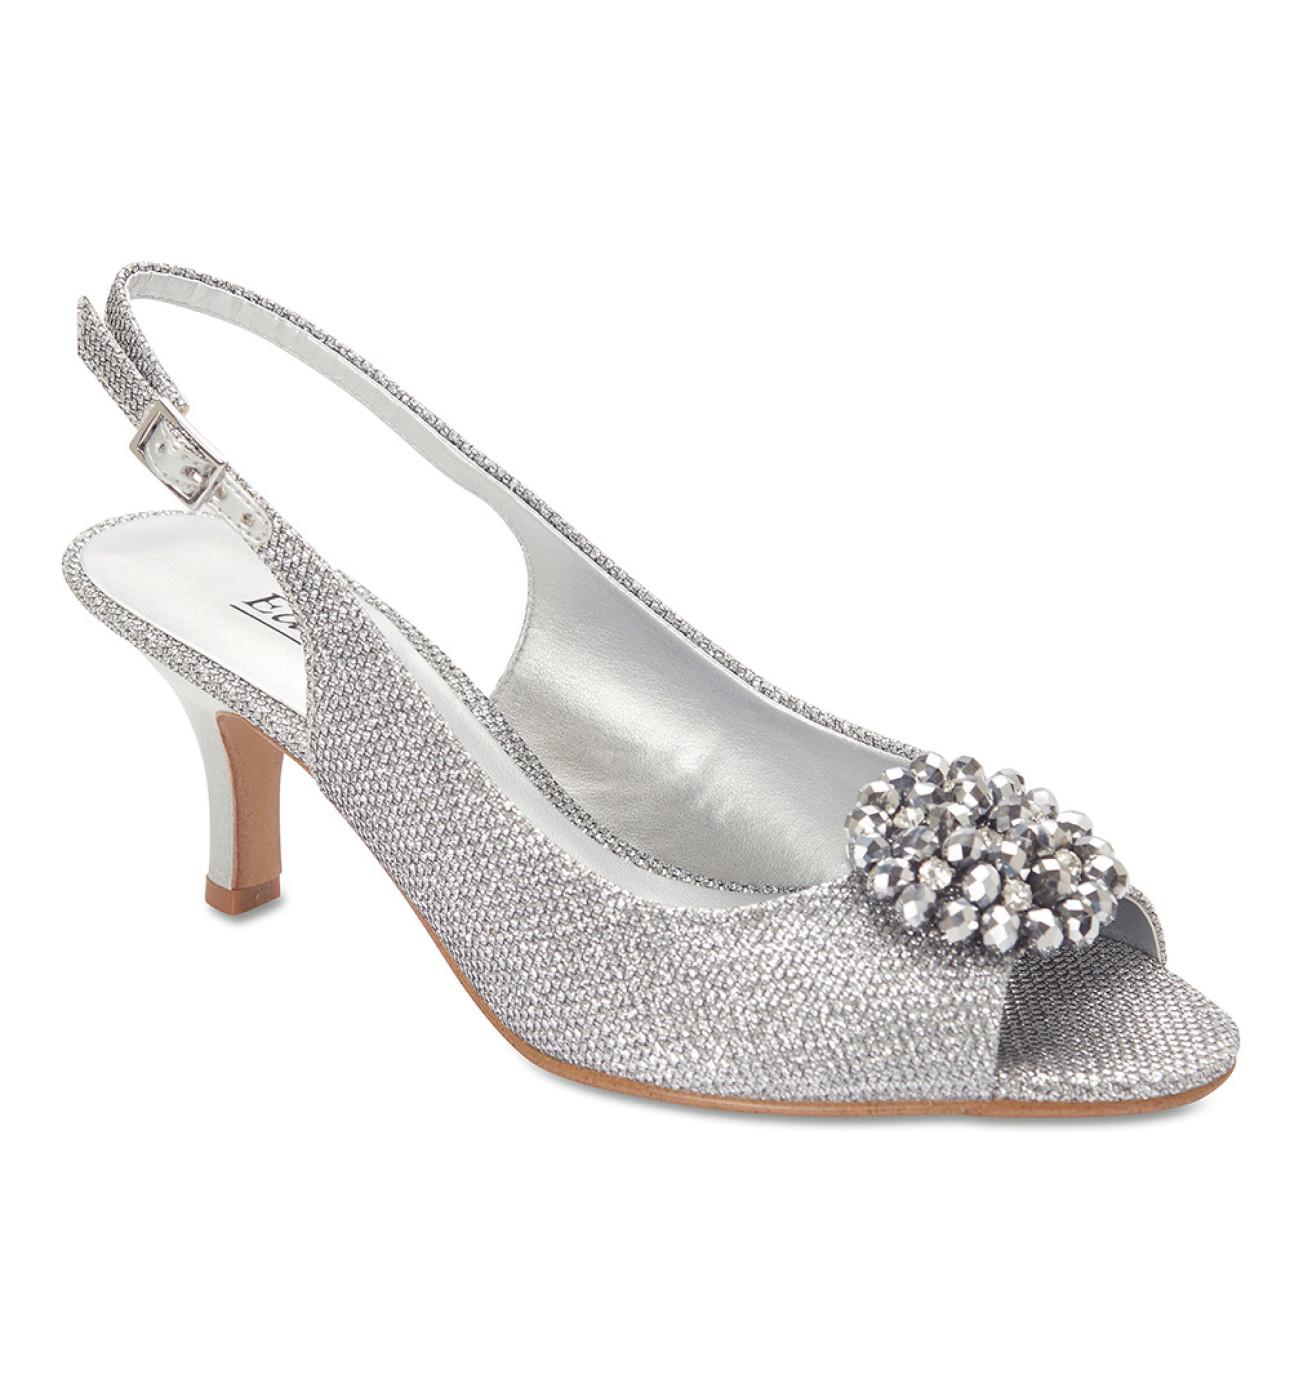 Flat Bridal Shoes Australia - 28 Images - Wedding Shoes ...